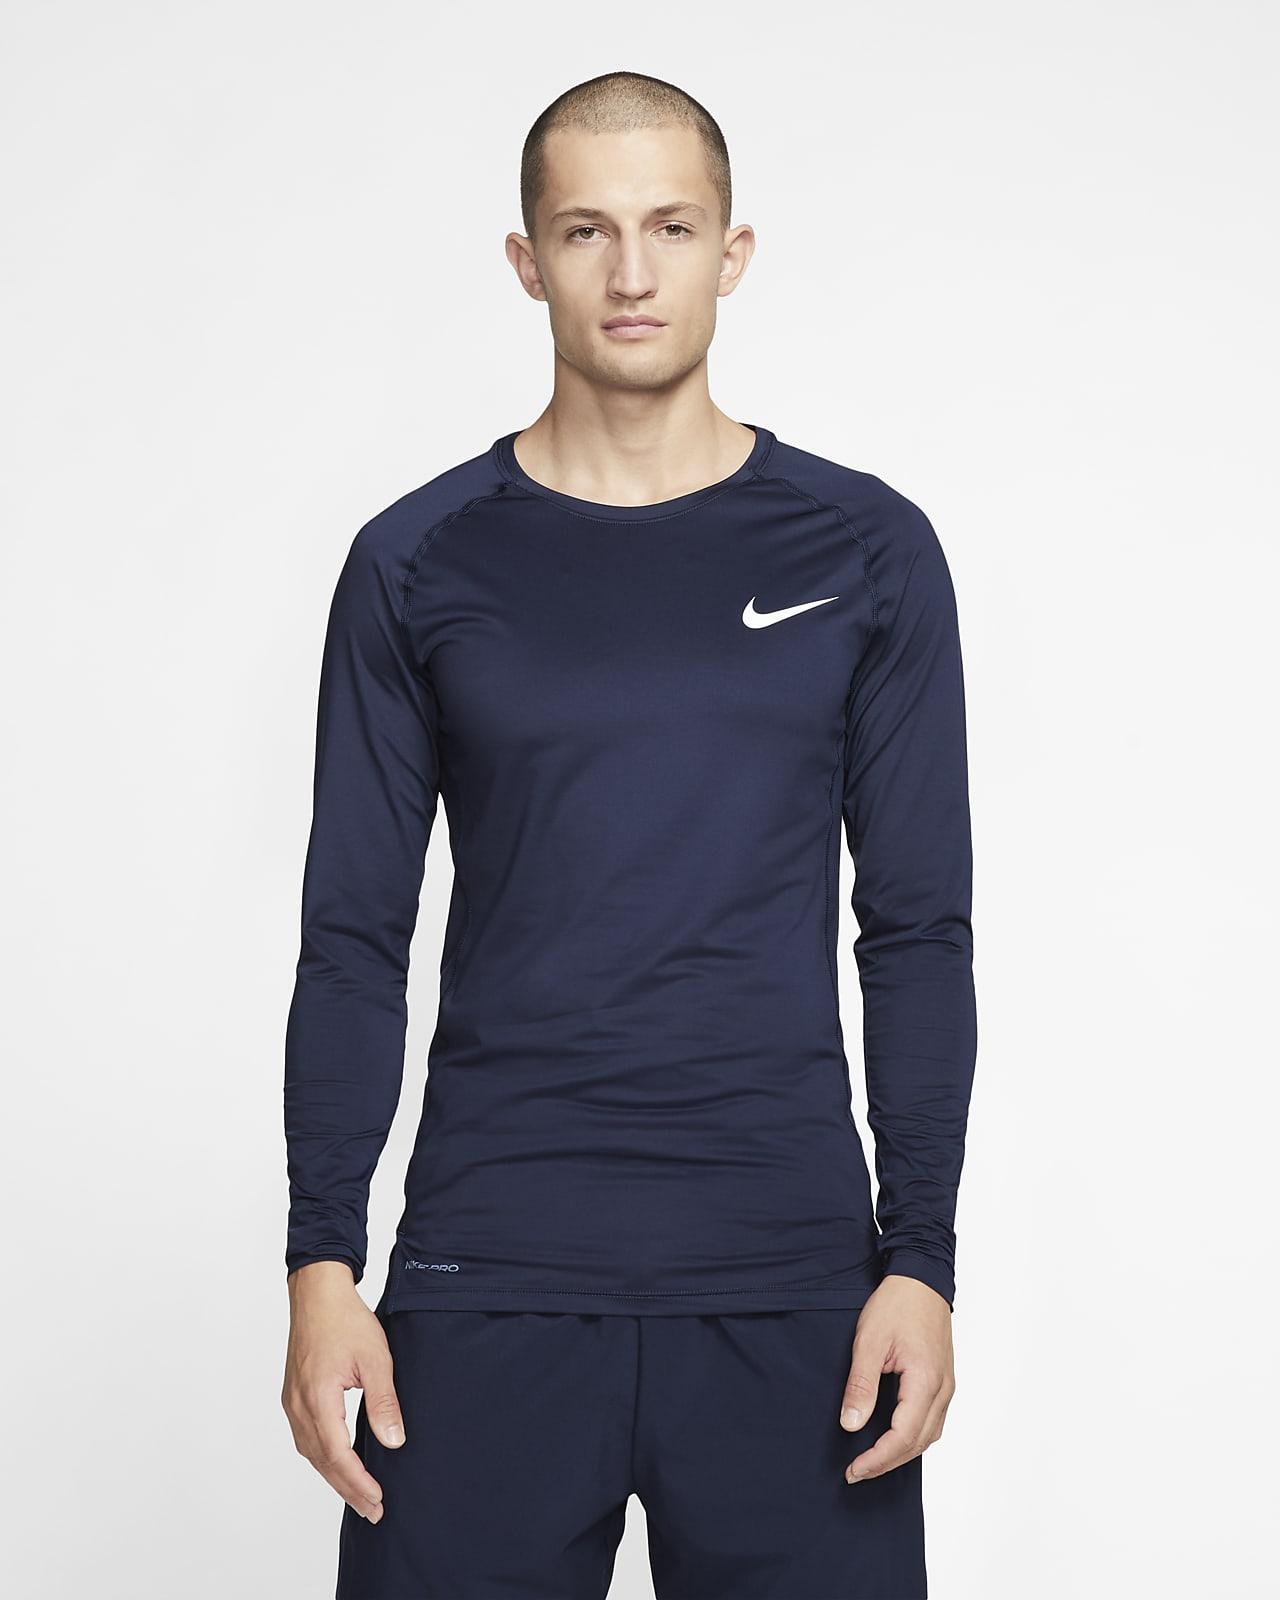 Prenda para la parte superior de manga larga con ajuste ceñido para hombre Nike Pro